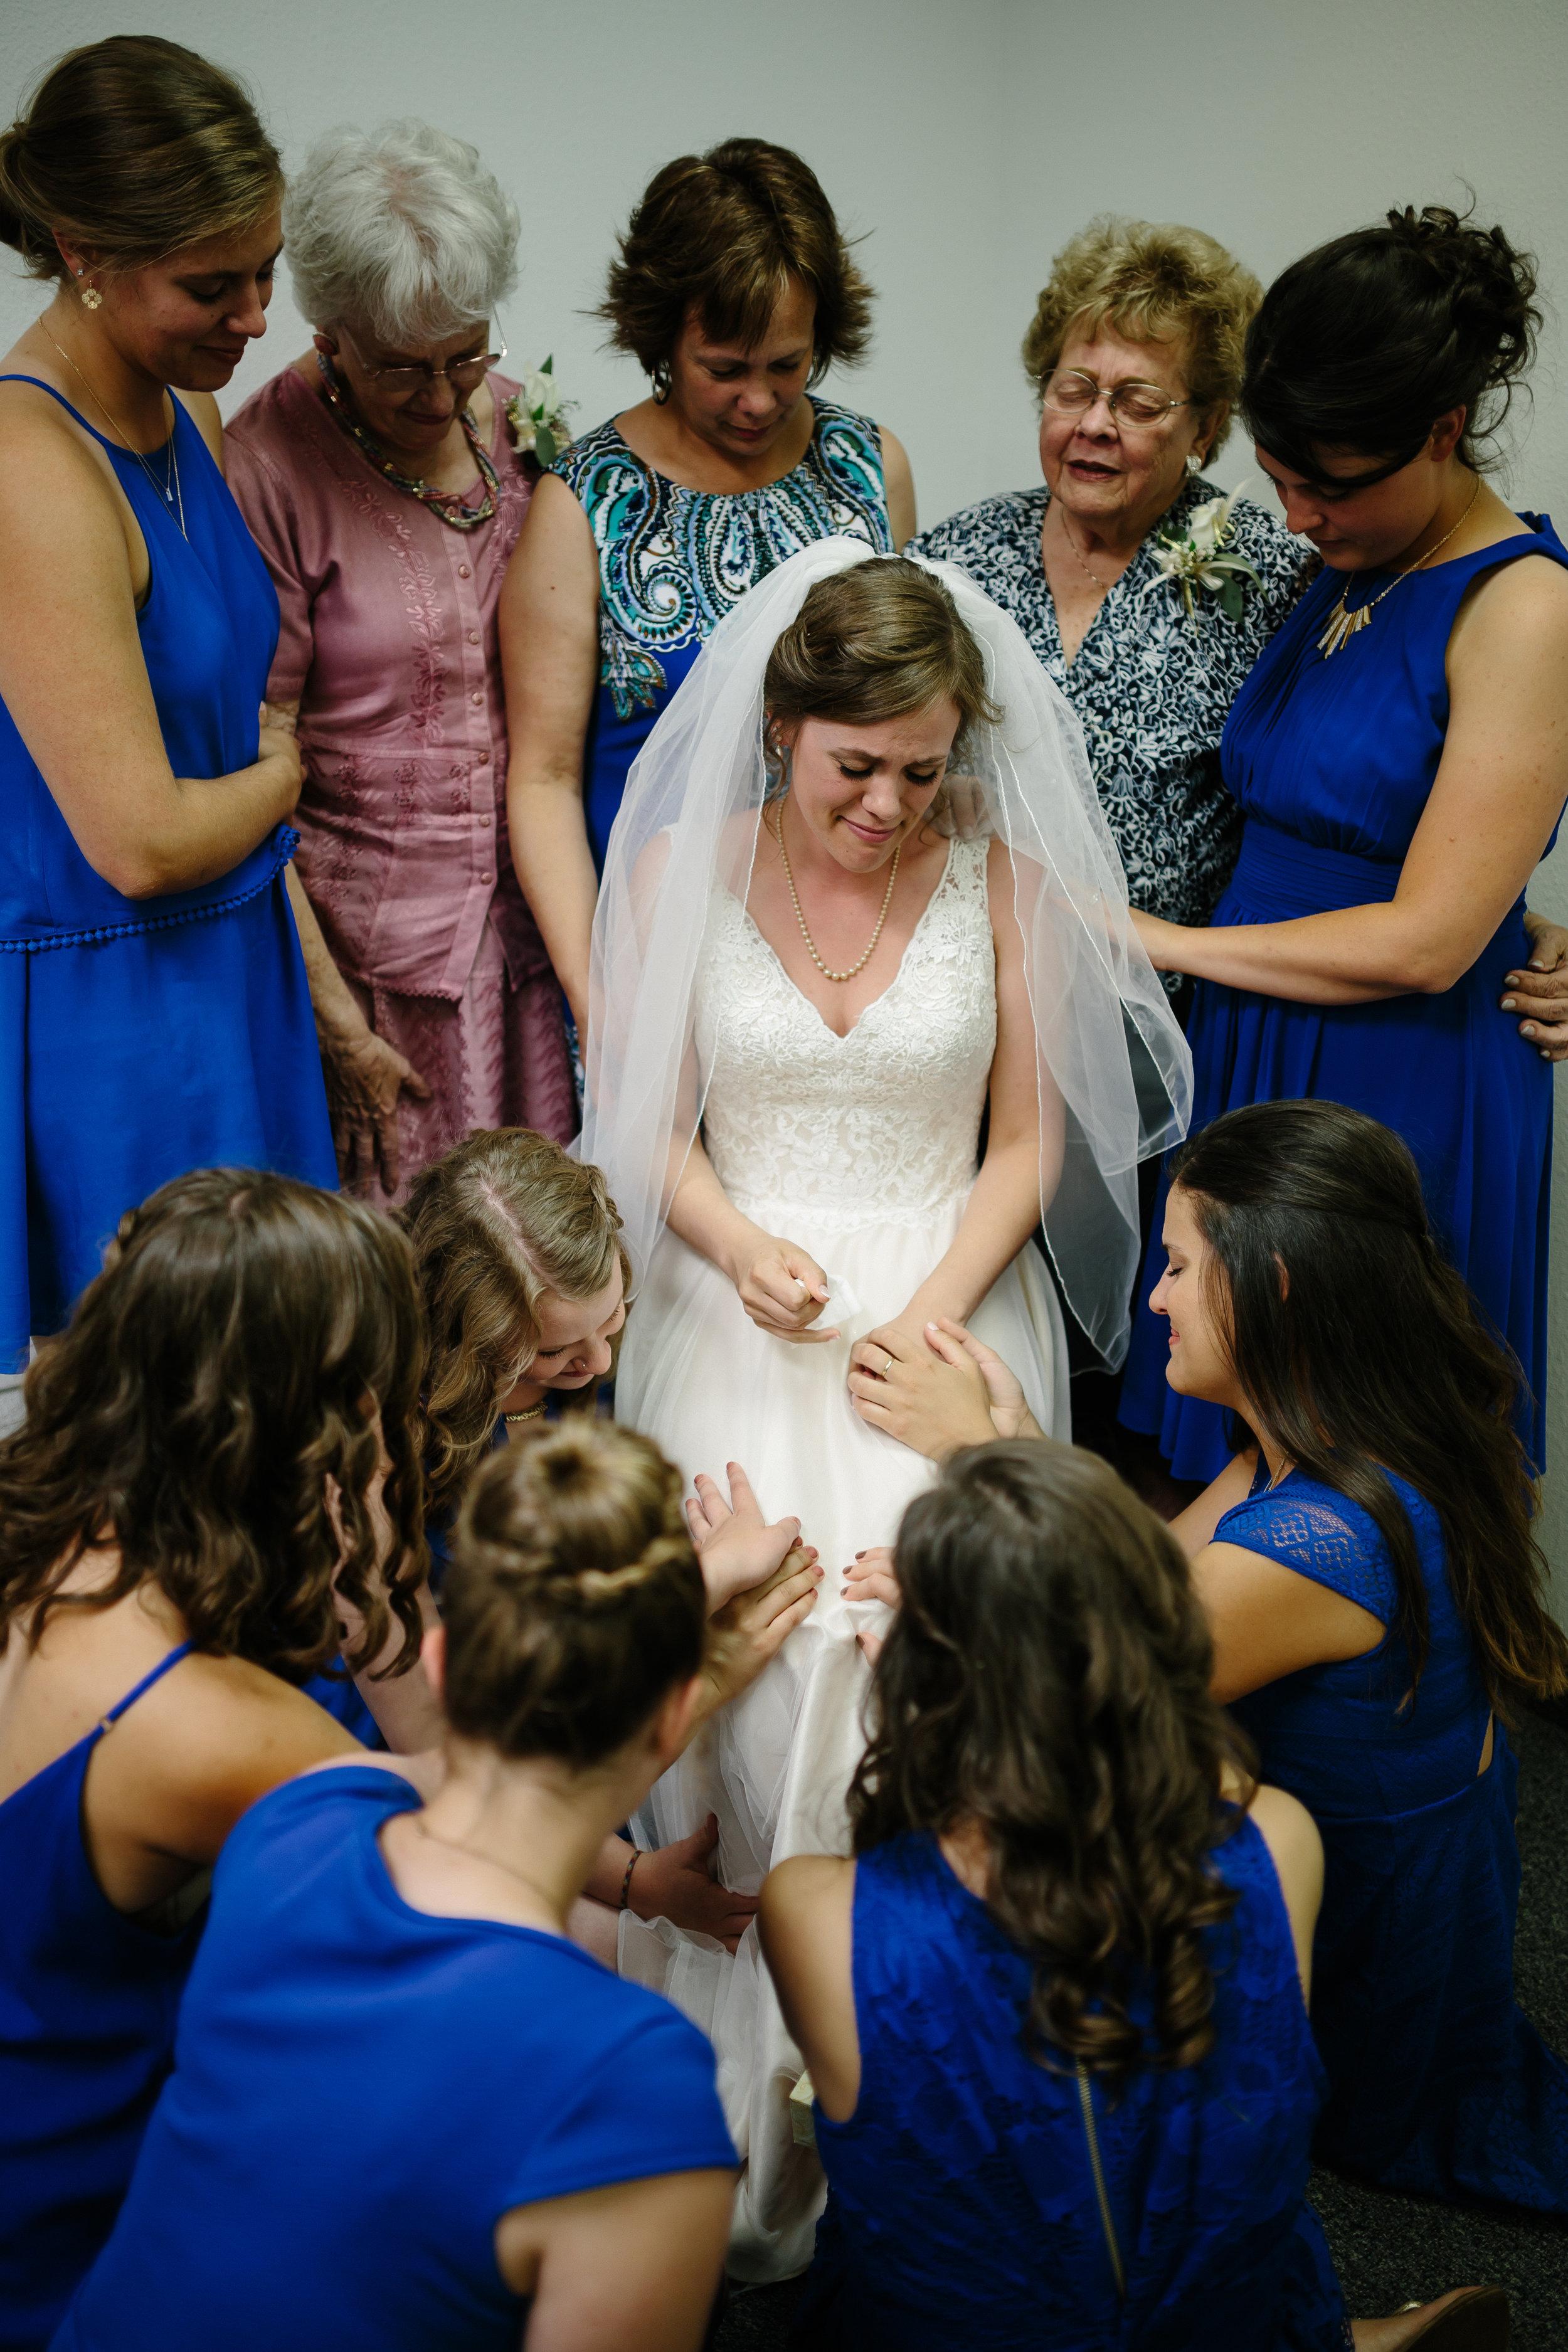 Jordan & Shantel Married - Idaho - Corrie Mick Photography-55.jpg